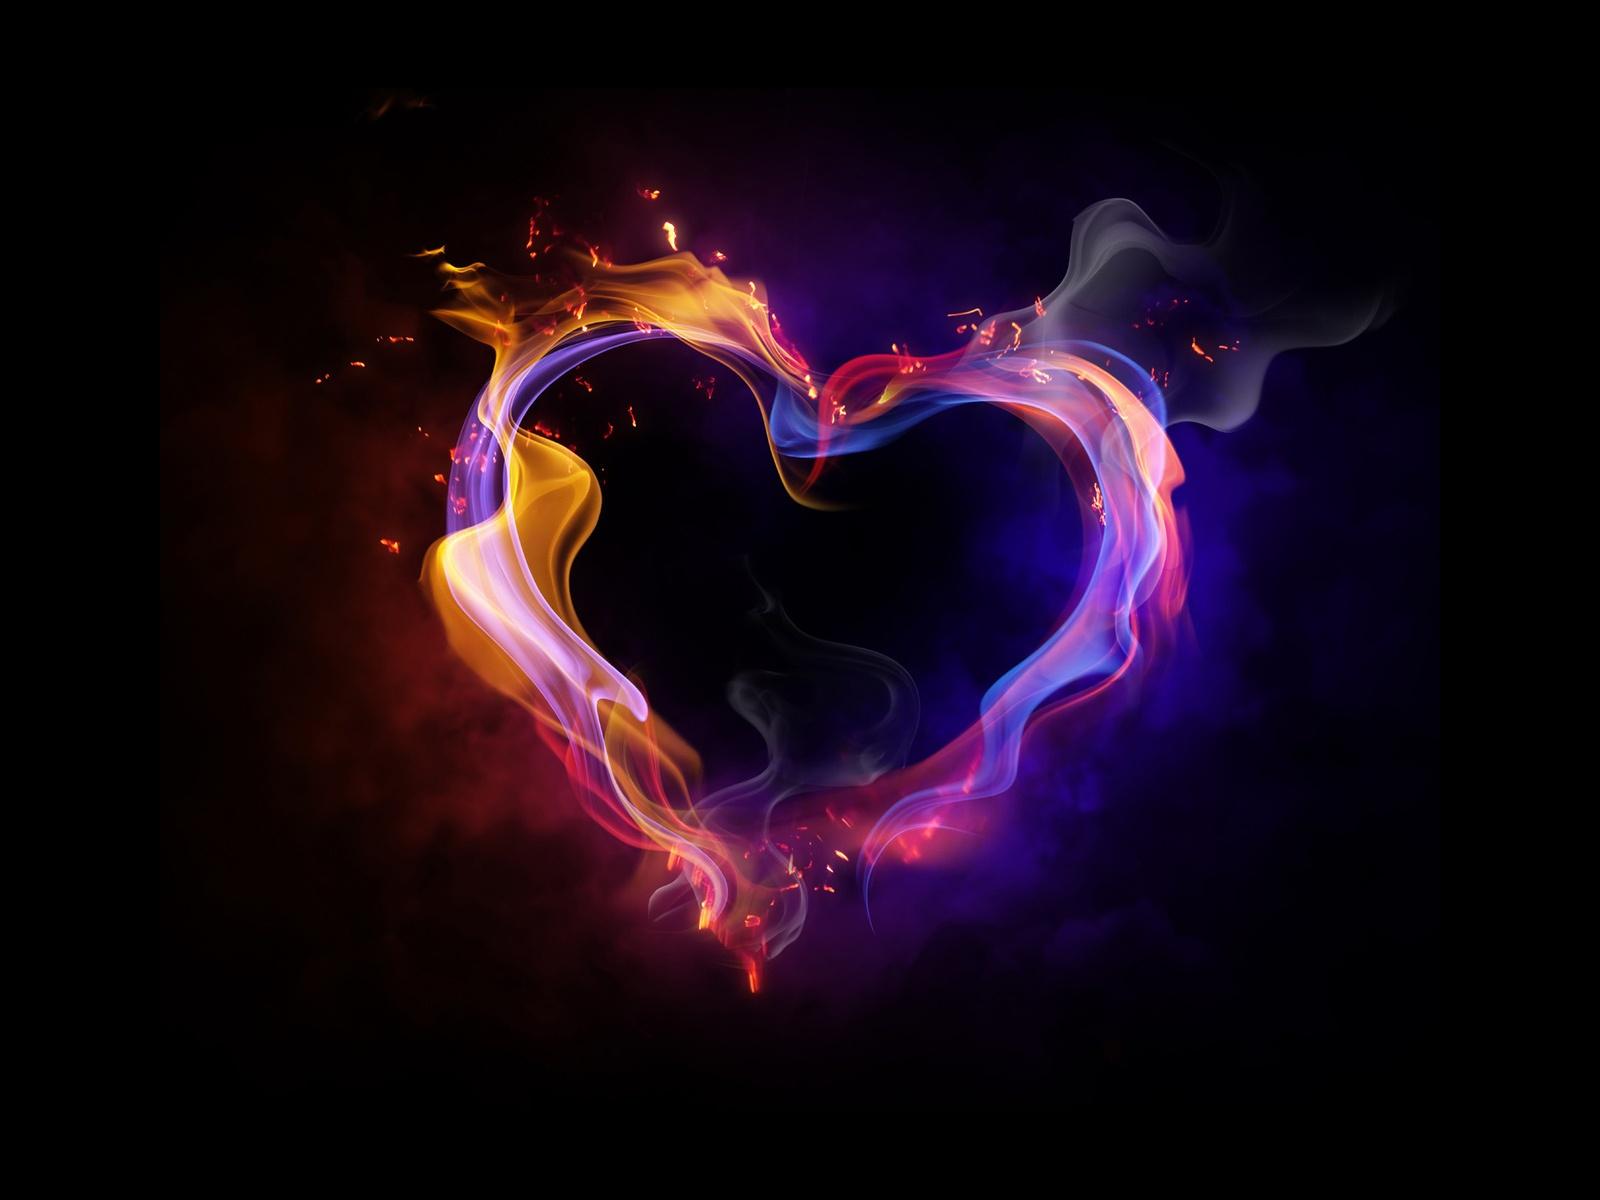 Amazing Wallpaper Love God - fire-heart-love-hd-wallpaper  Pictures_452690.jpg